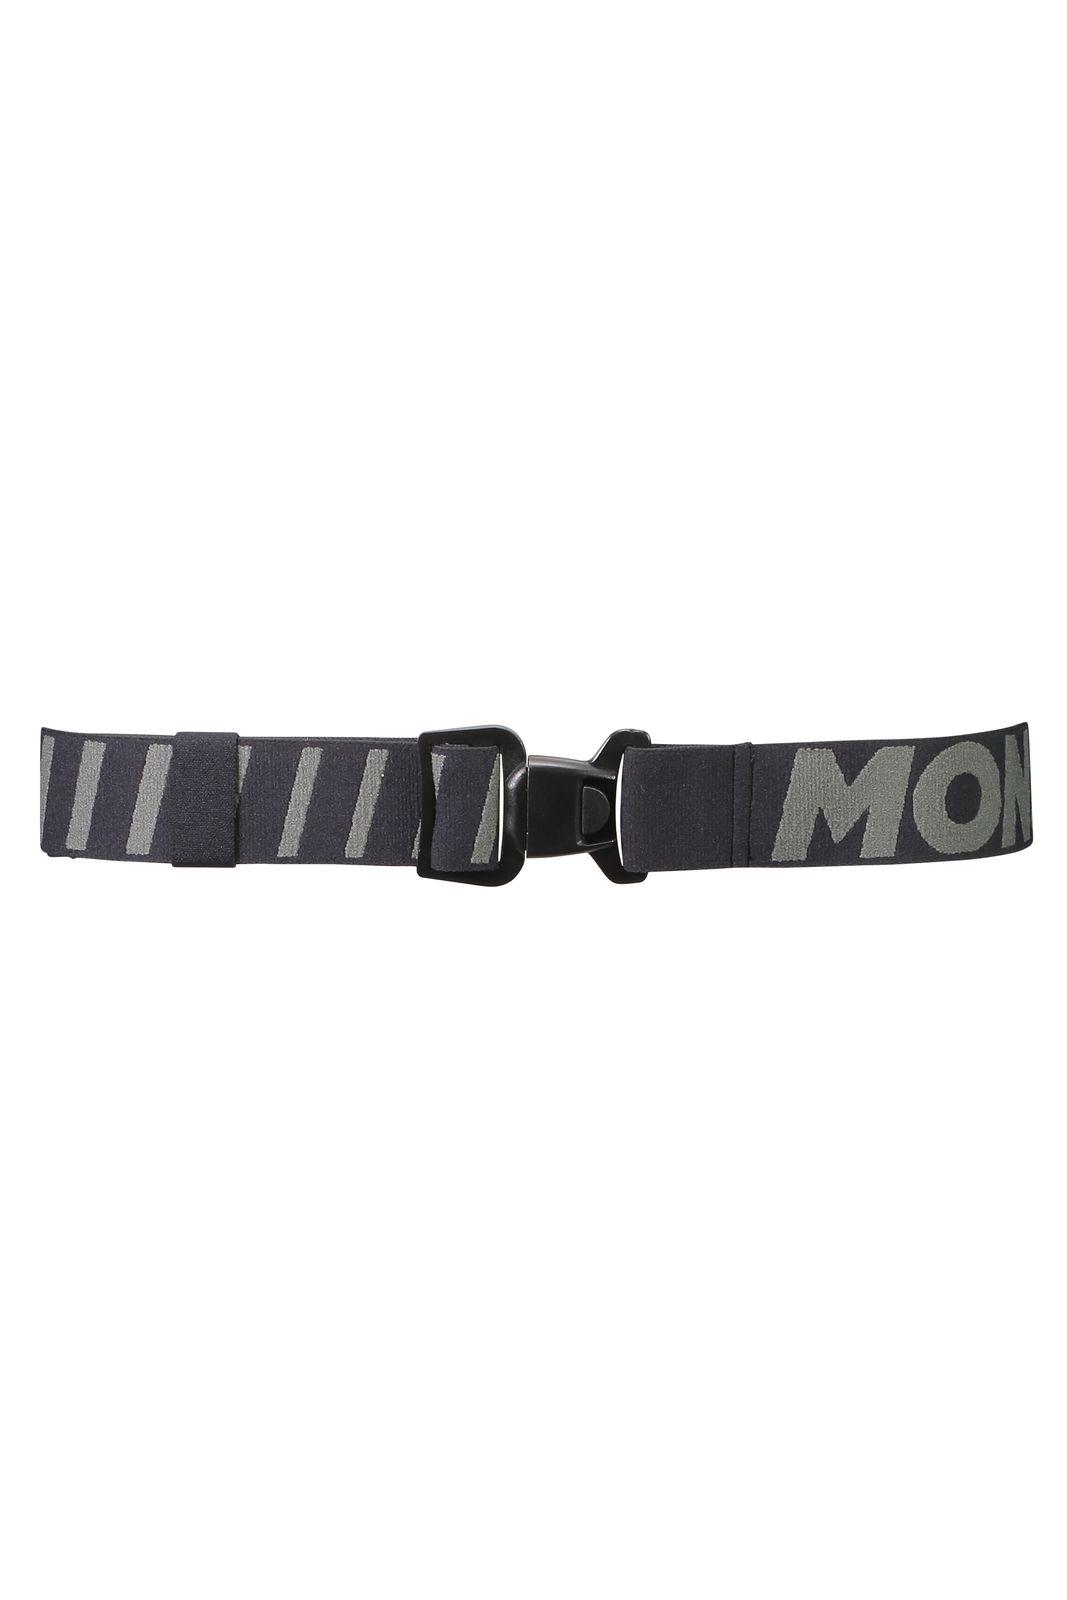 MONS ROYALE Birving Belt - Bælte - Unisex - Sort/Grå - Str. Onesize | misc_clothes